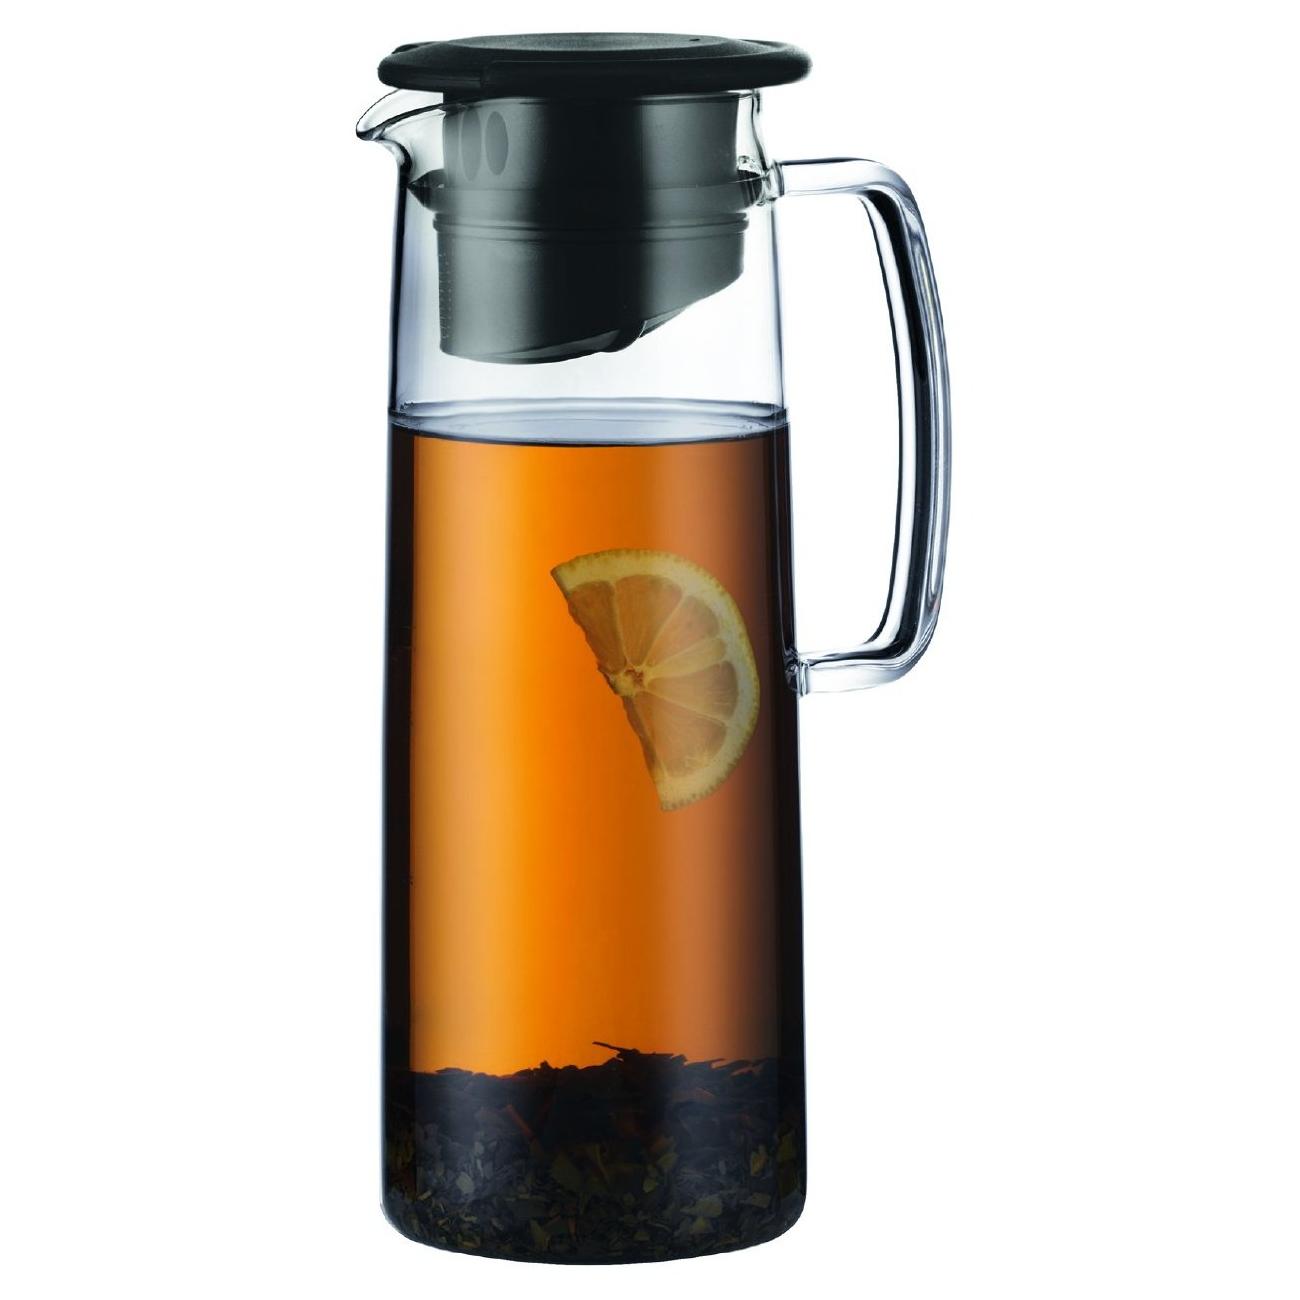 Bodum Biasca Glass 40 Ounce Black Ice Green Tea Jug with Black Lid